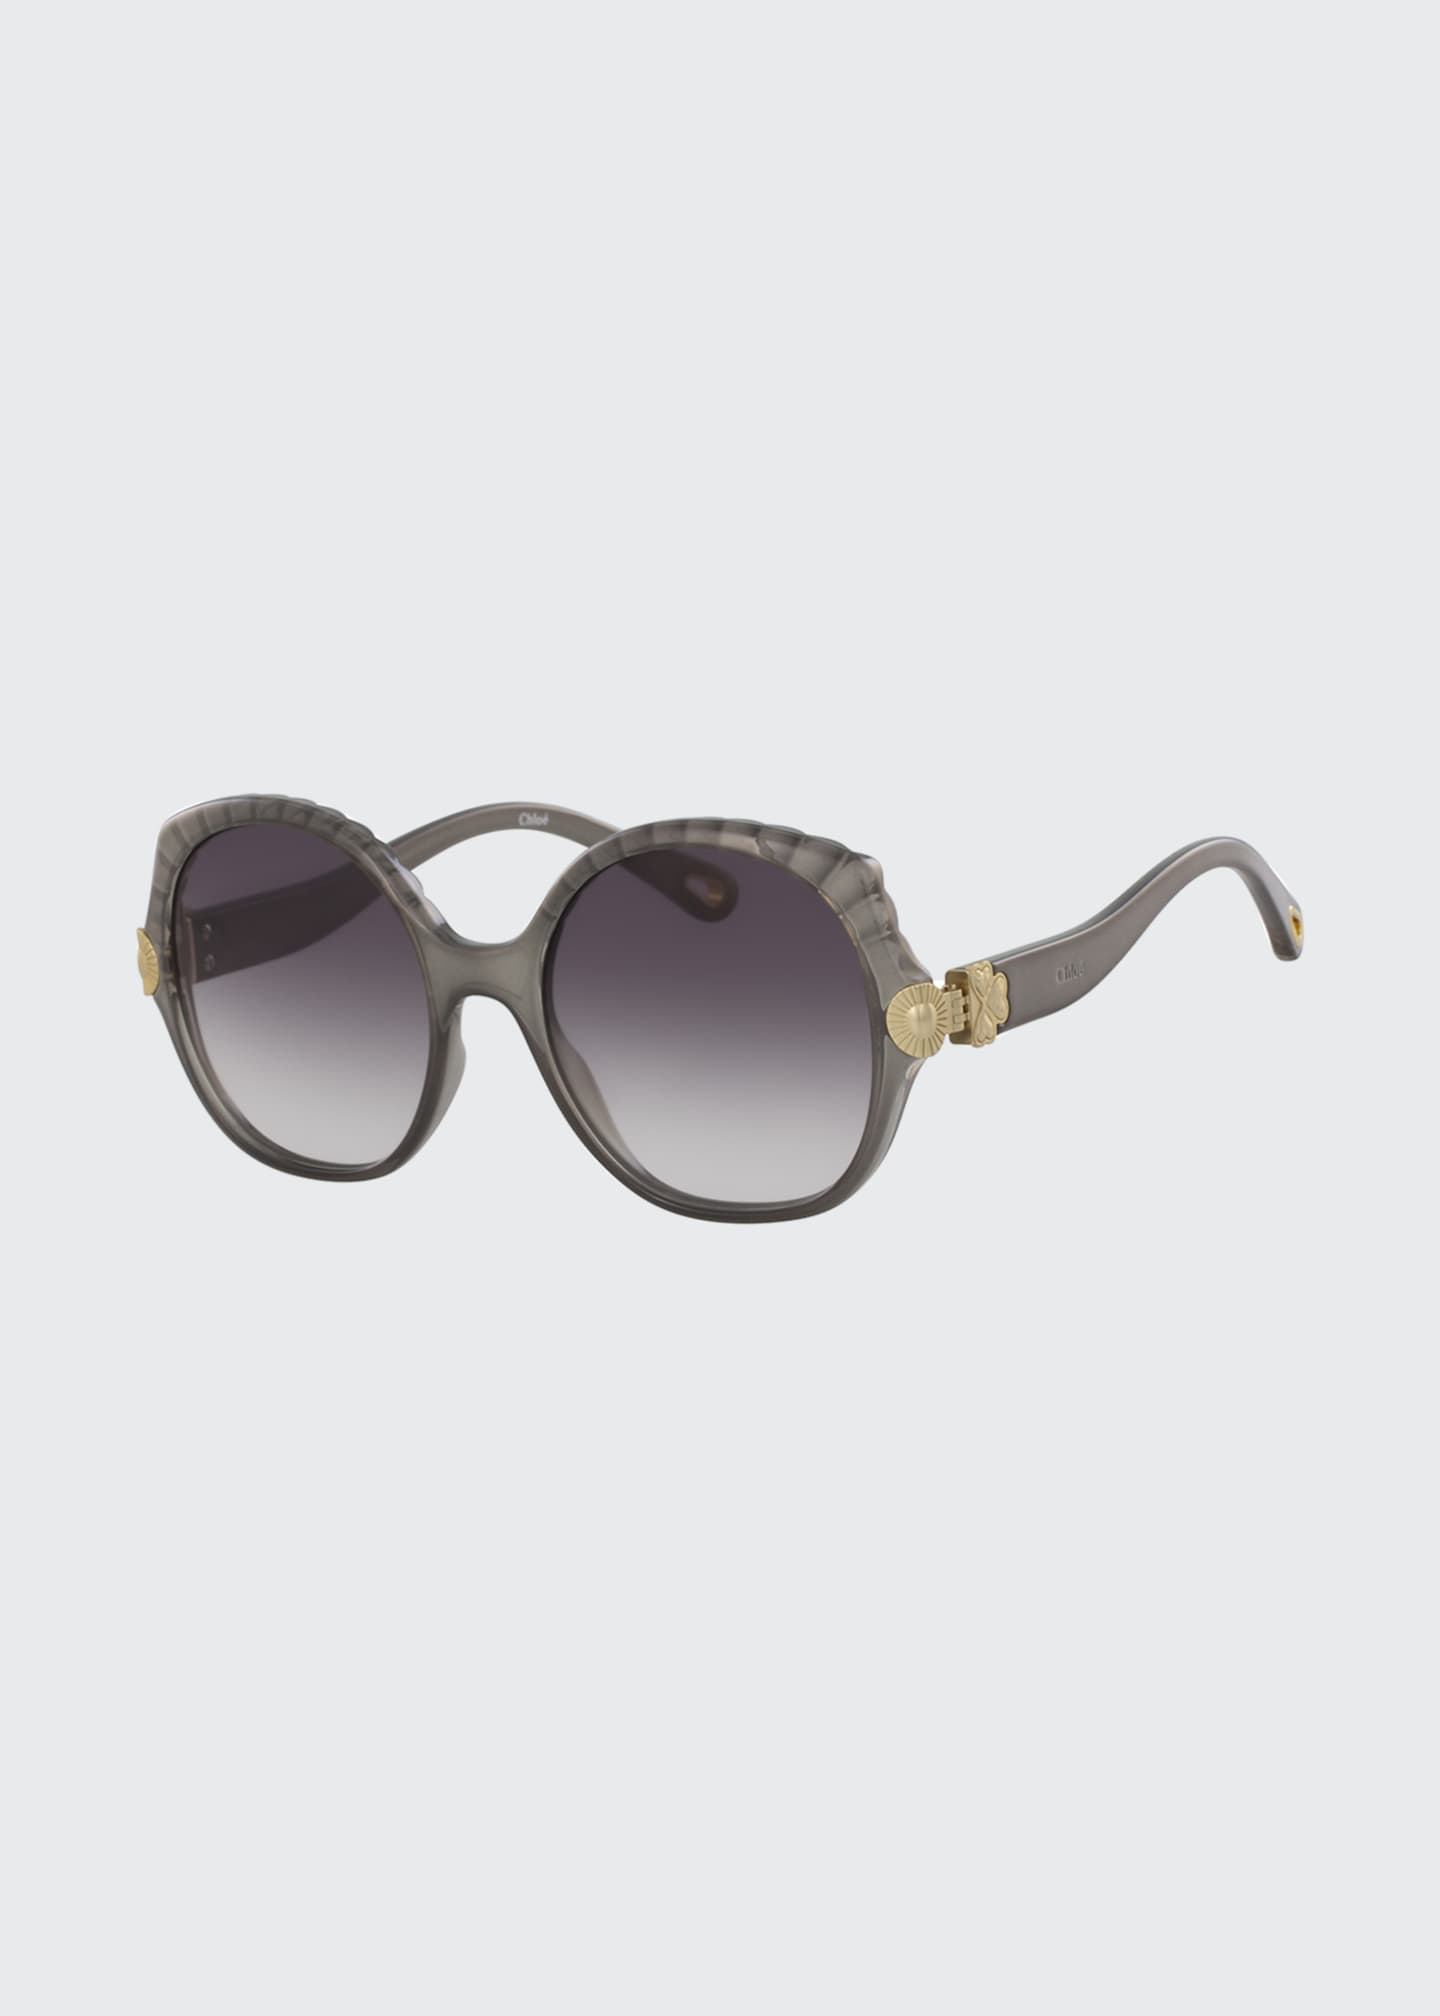 Chloe Scalloped Round Plastic Sunglasses